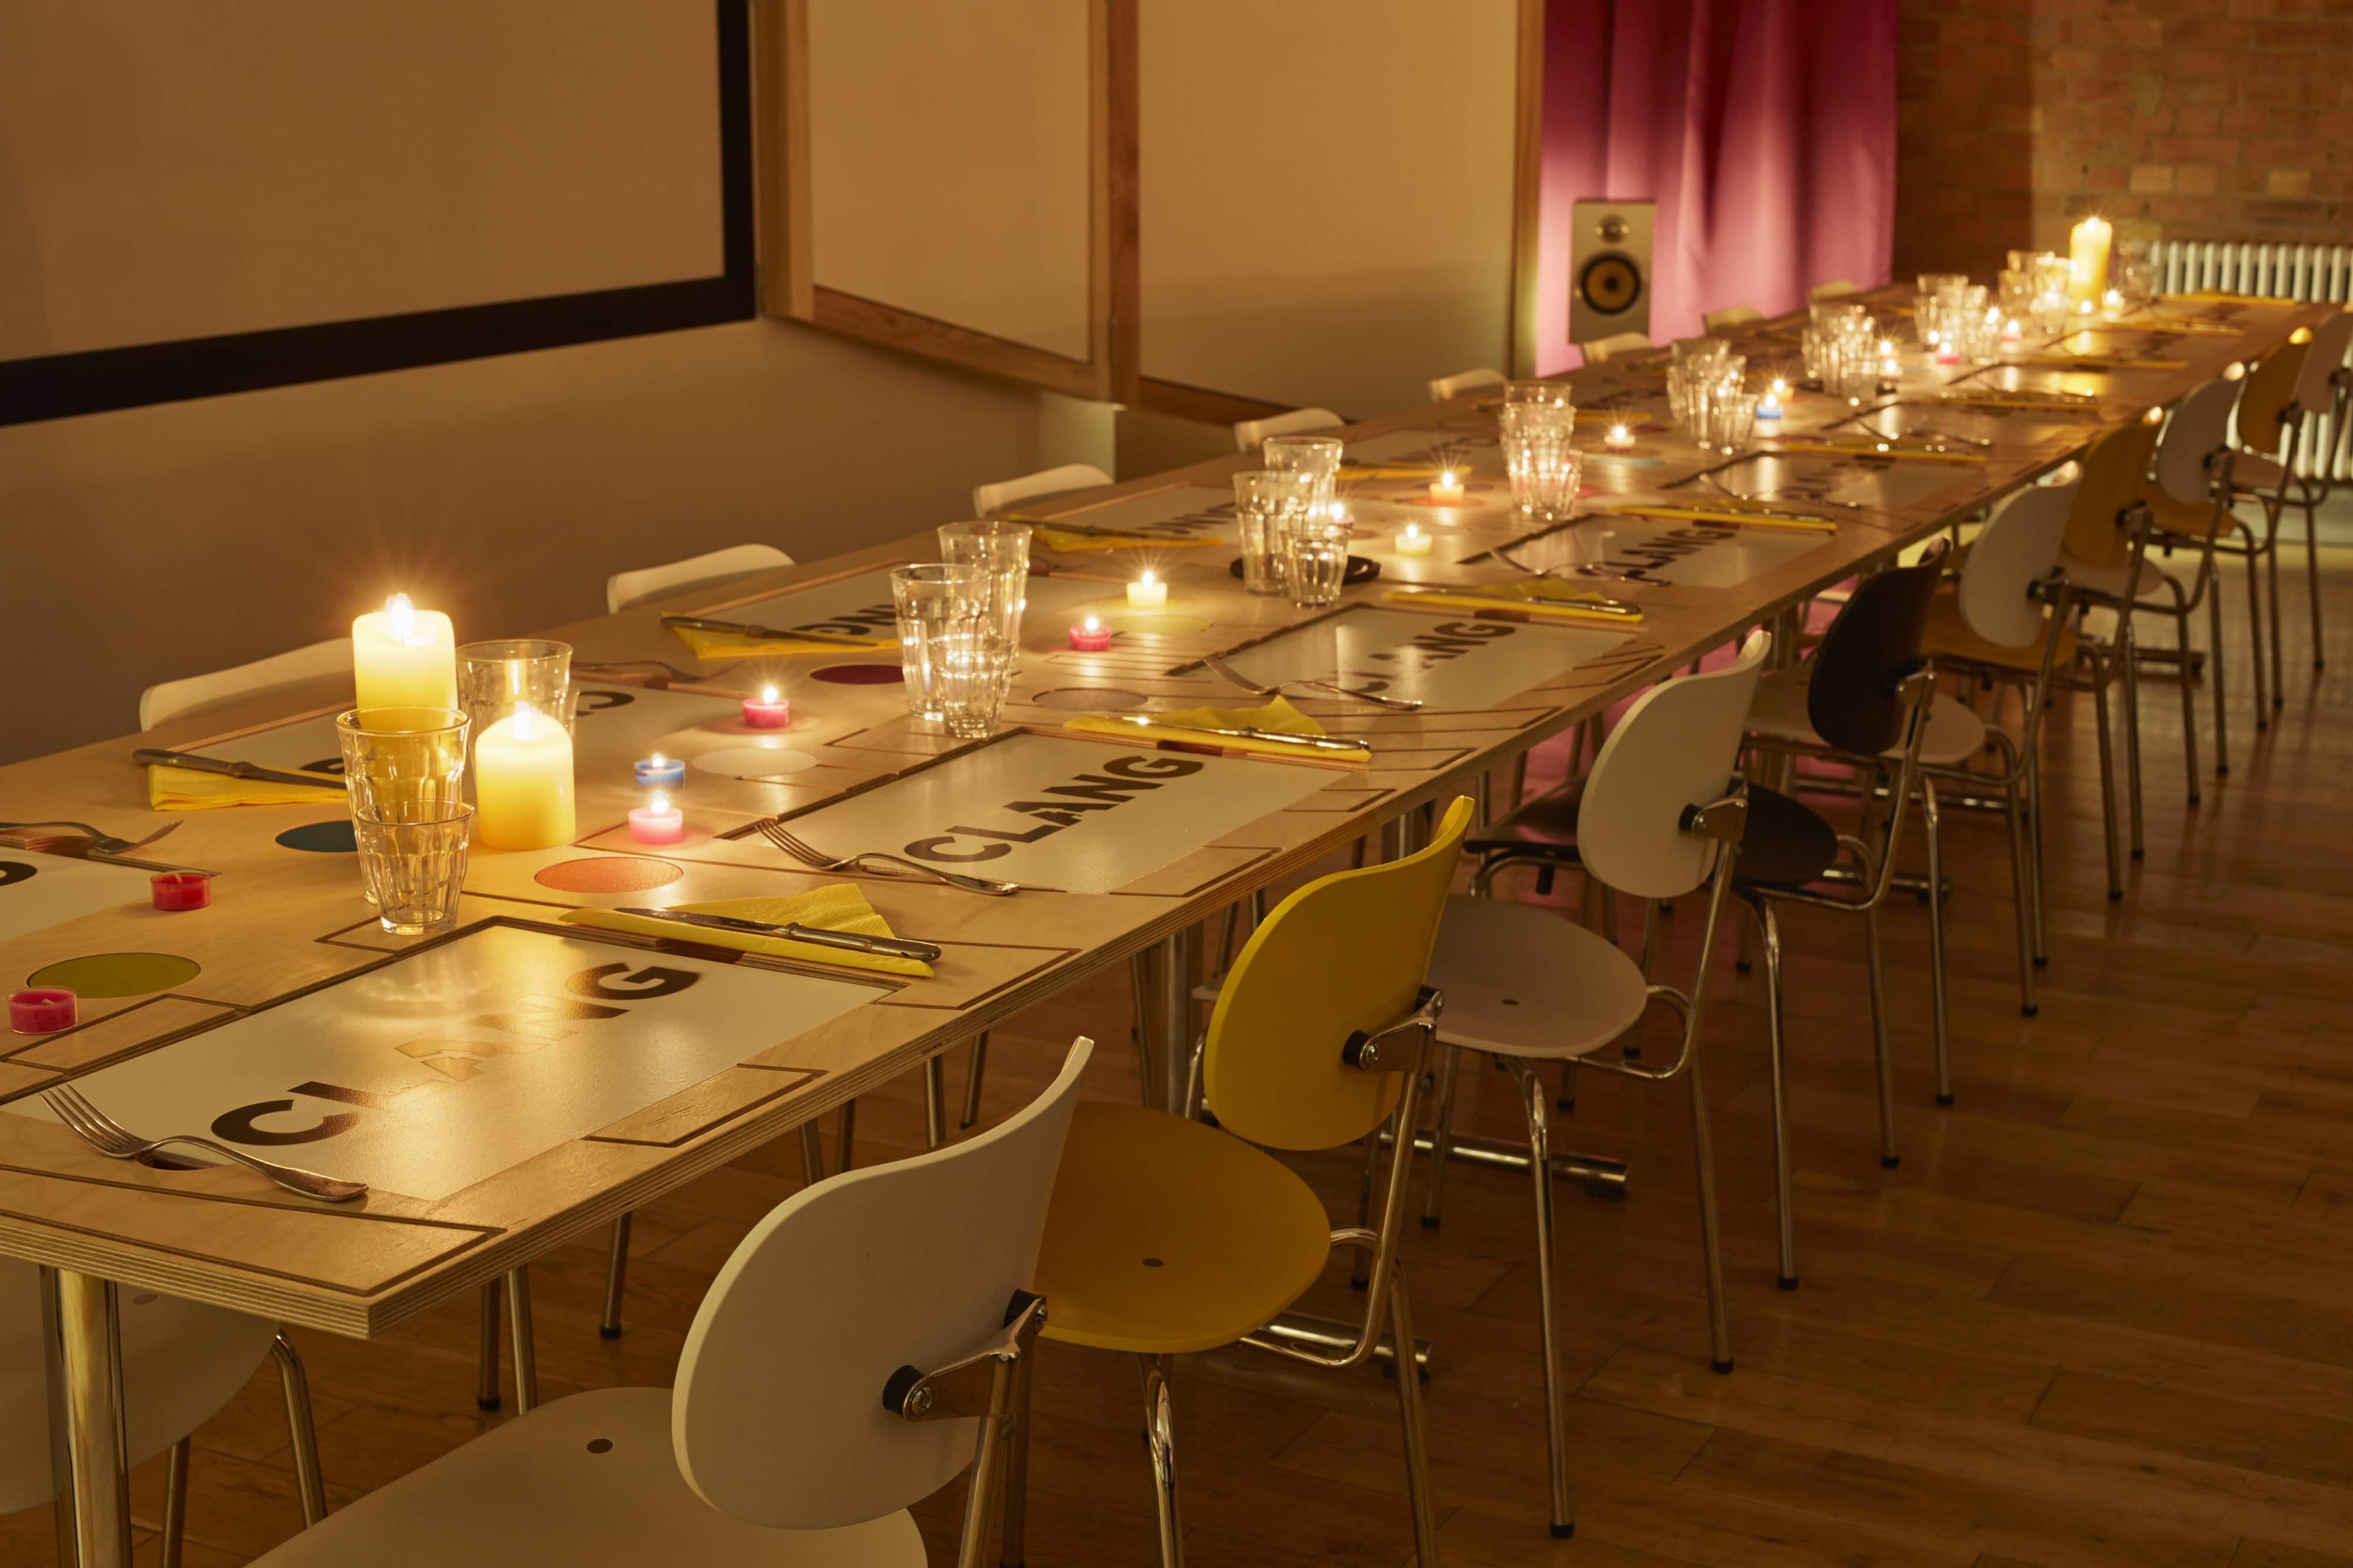 14. Sto_Klassnik_Acoustic Dining Table